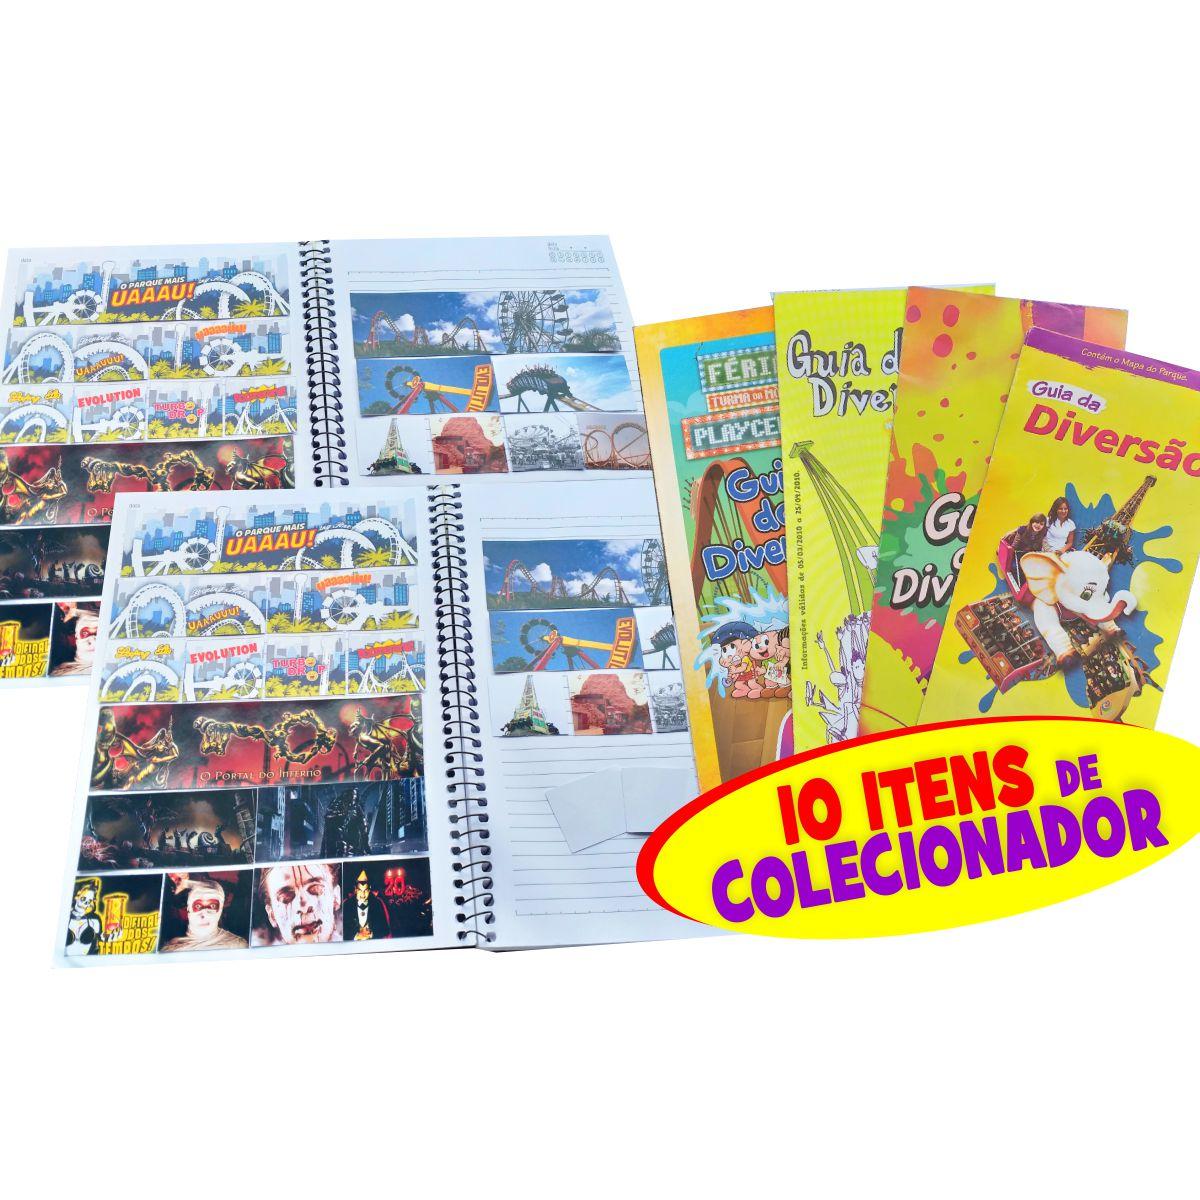 3 Coleções em DOBRO (42 adesivos + 06 surpresa + Kit Premium! R$ 34,80)